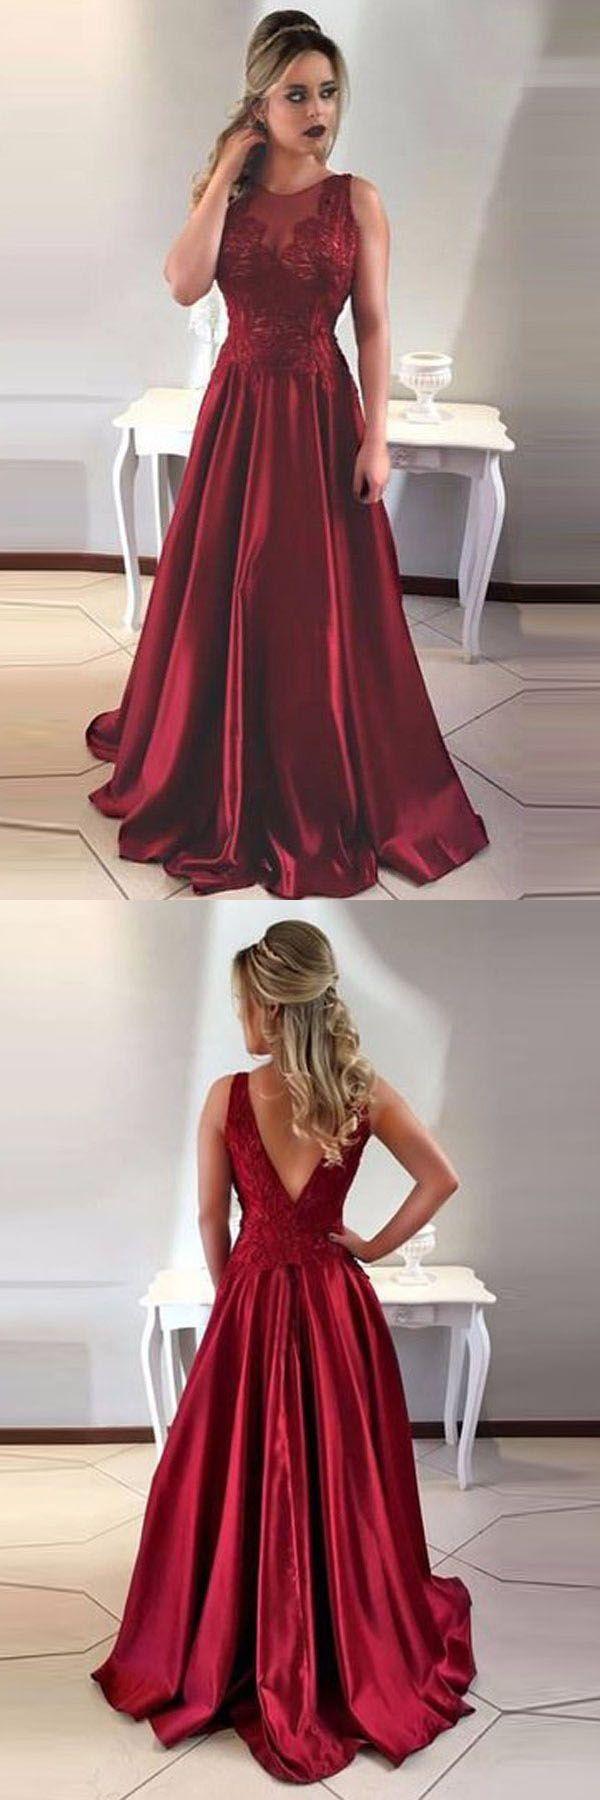 miaalafacii debs x pinterest long lace prom dresses lace